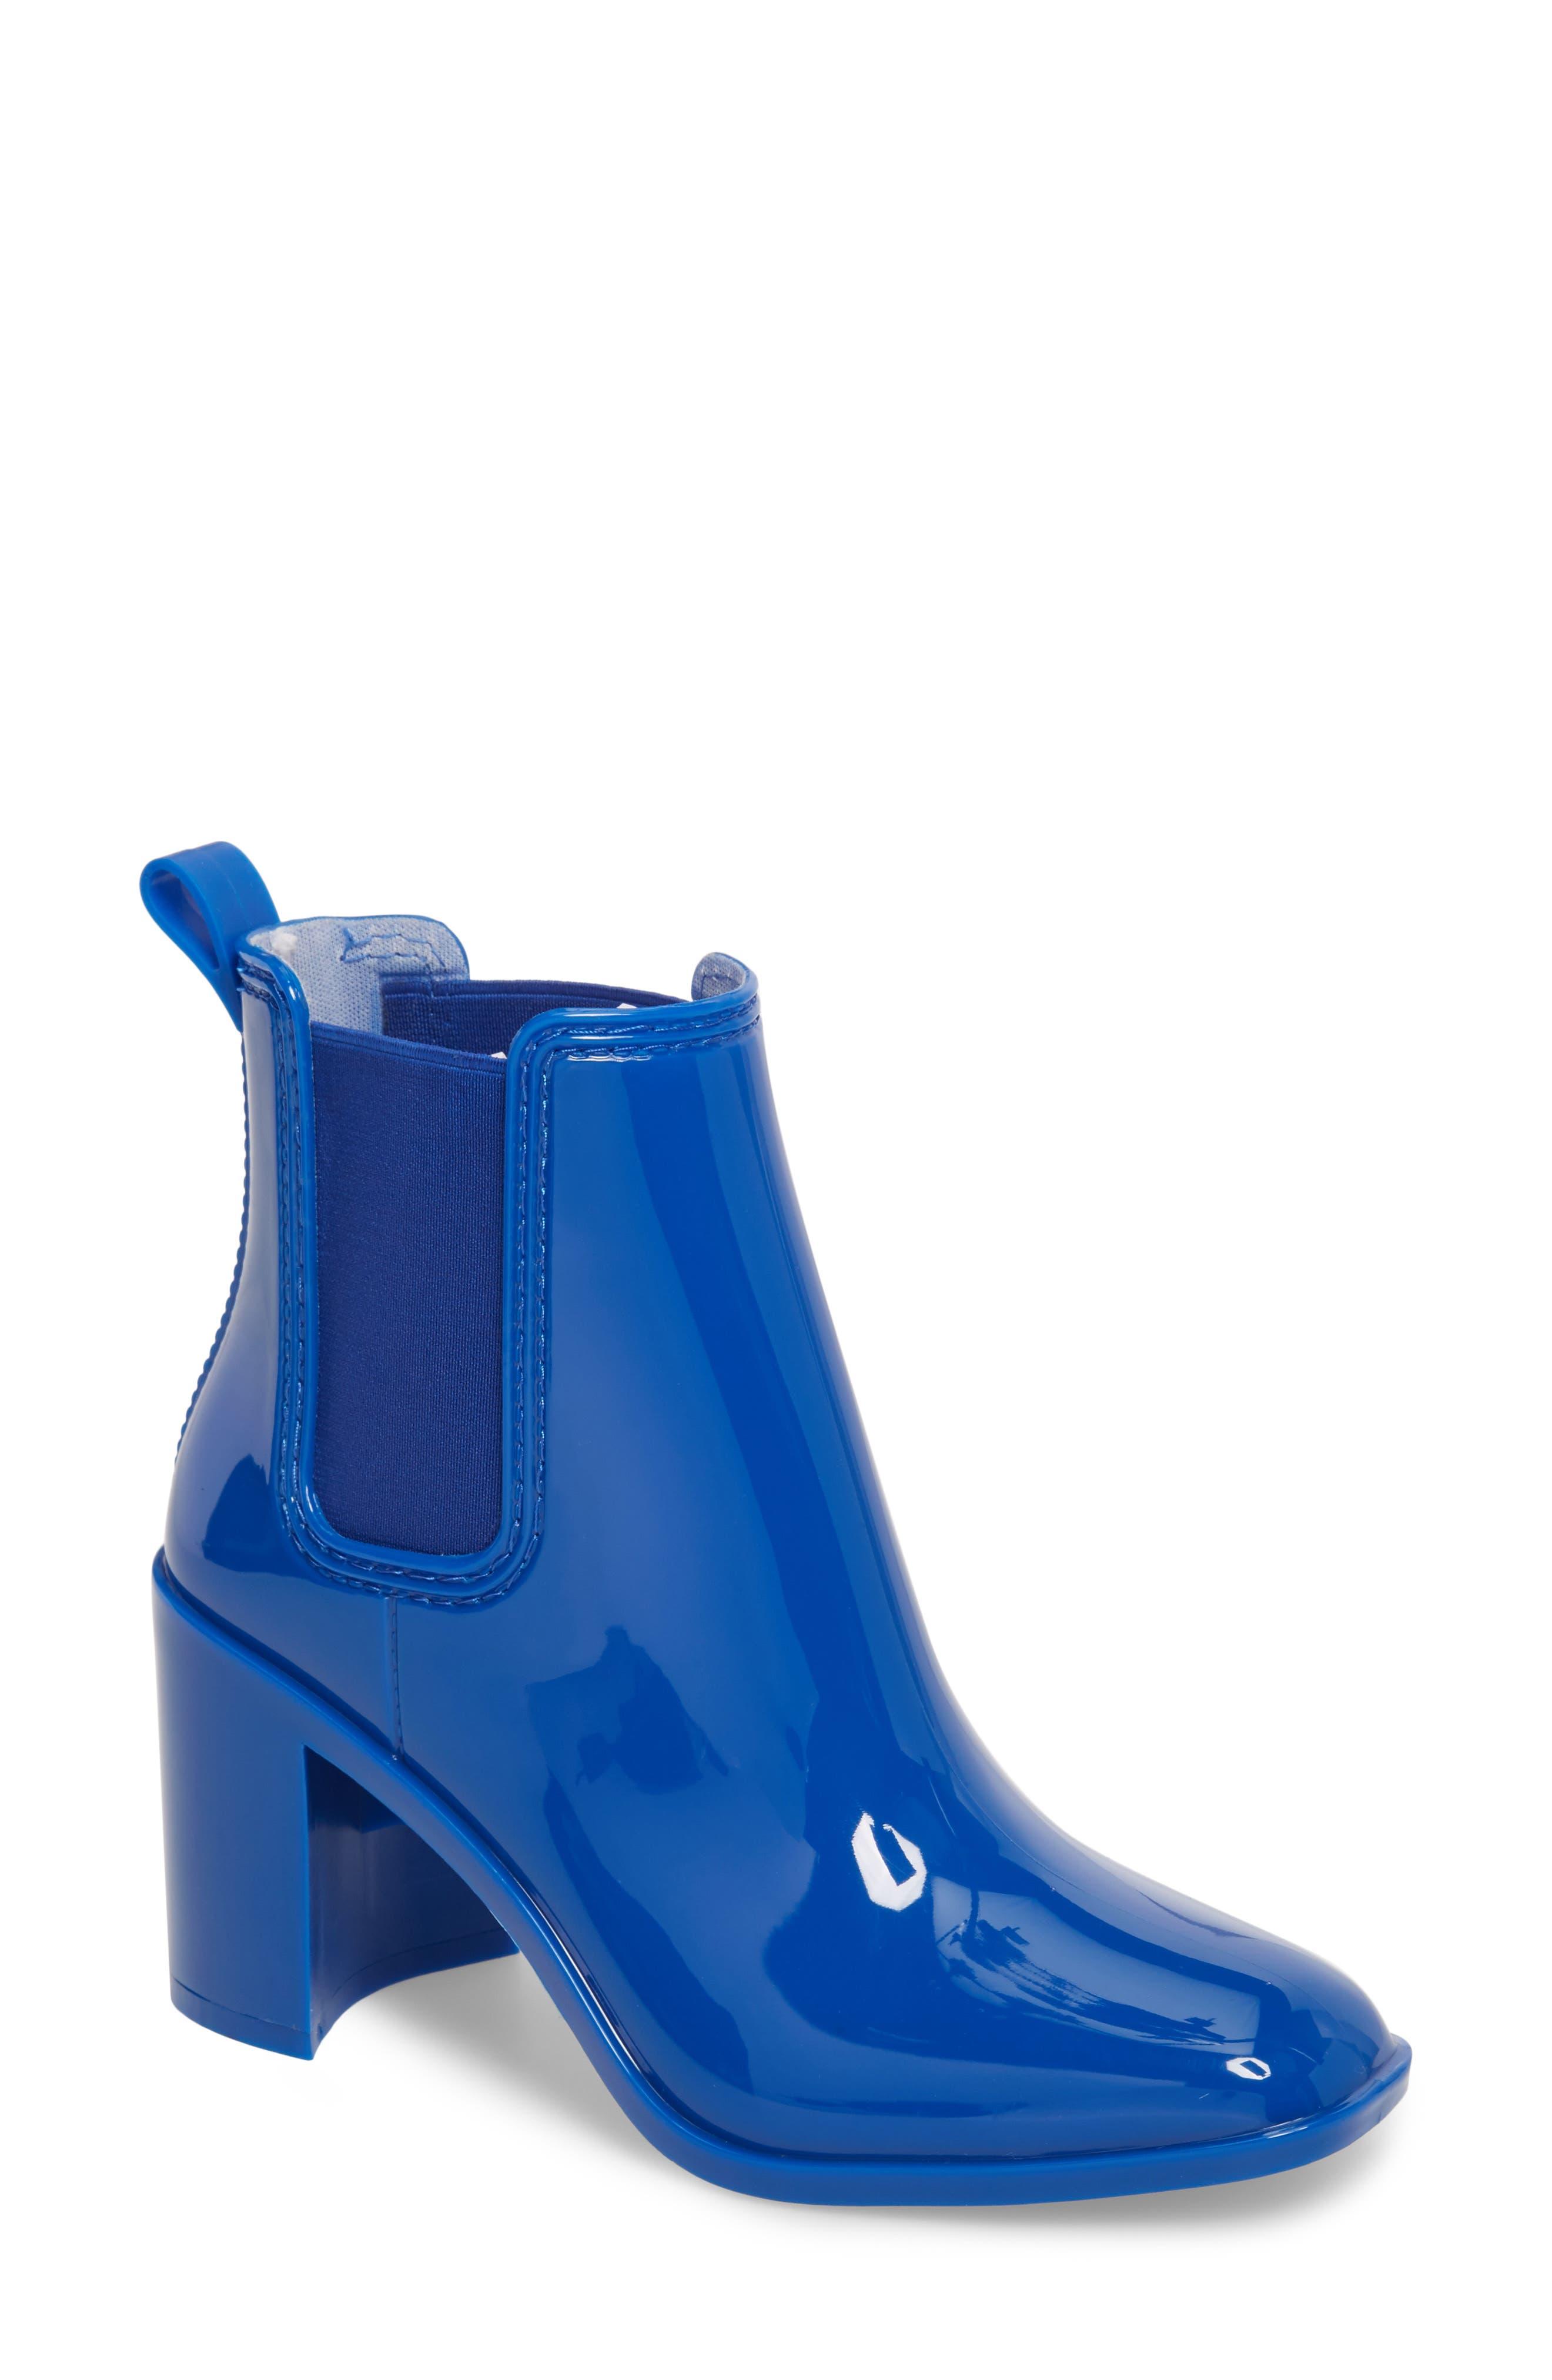 Women's Blue Shoes   Nordstrom